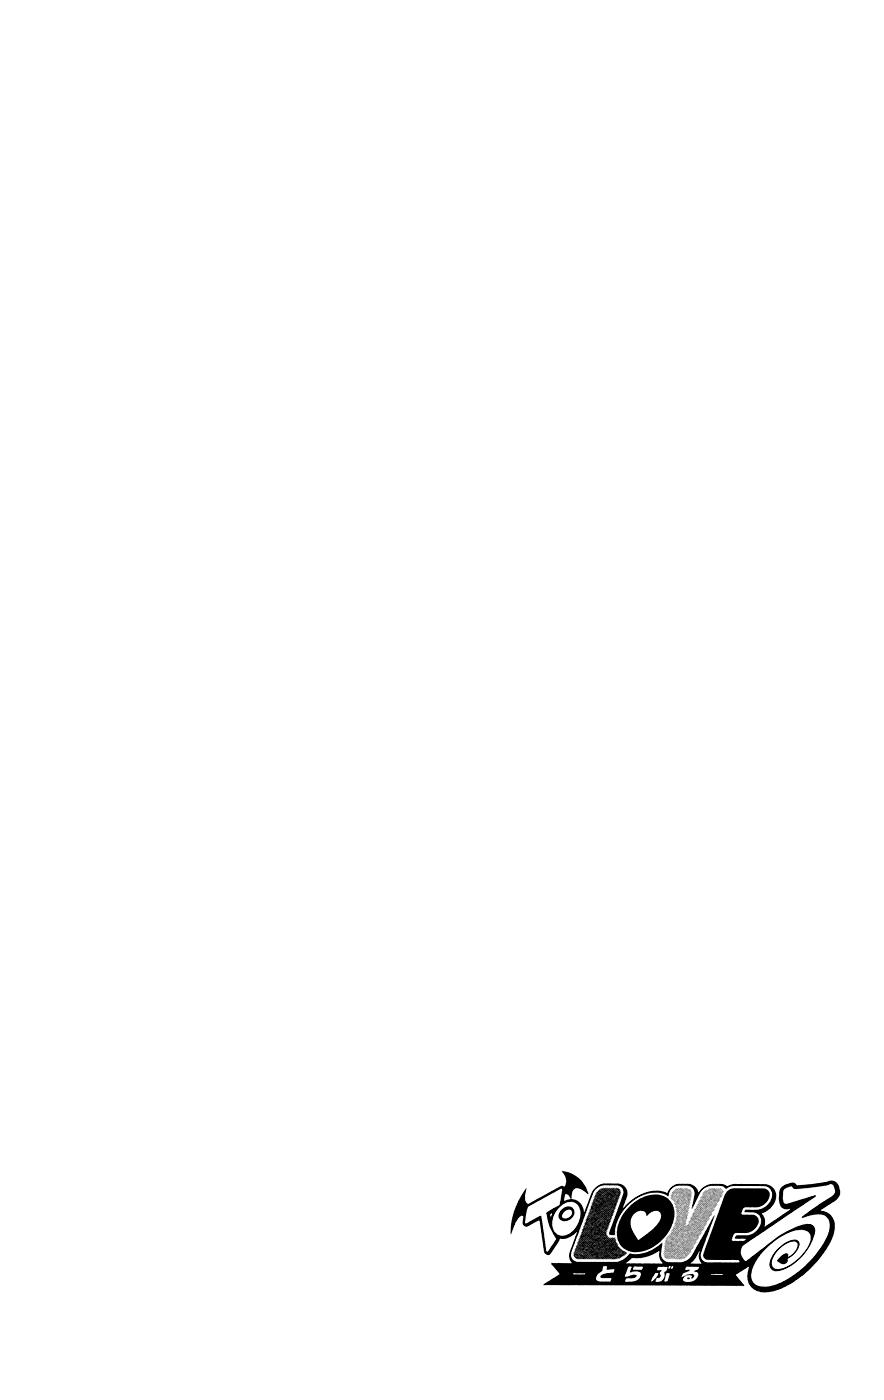 Манга Любовные неприятности / To Love-Ru  - Том 14 Глава 120 Страница 20